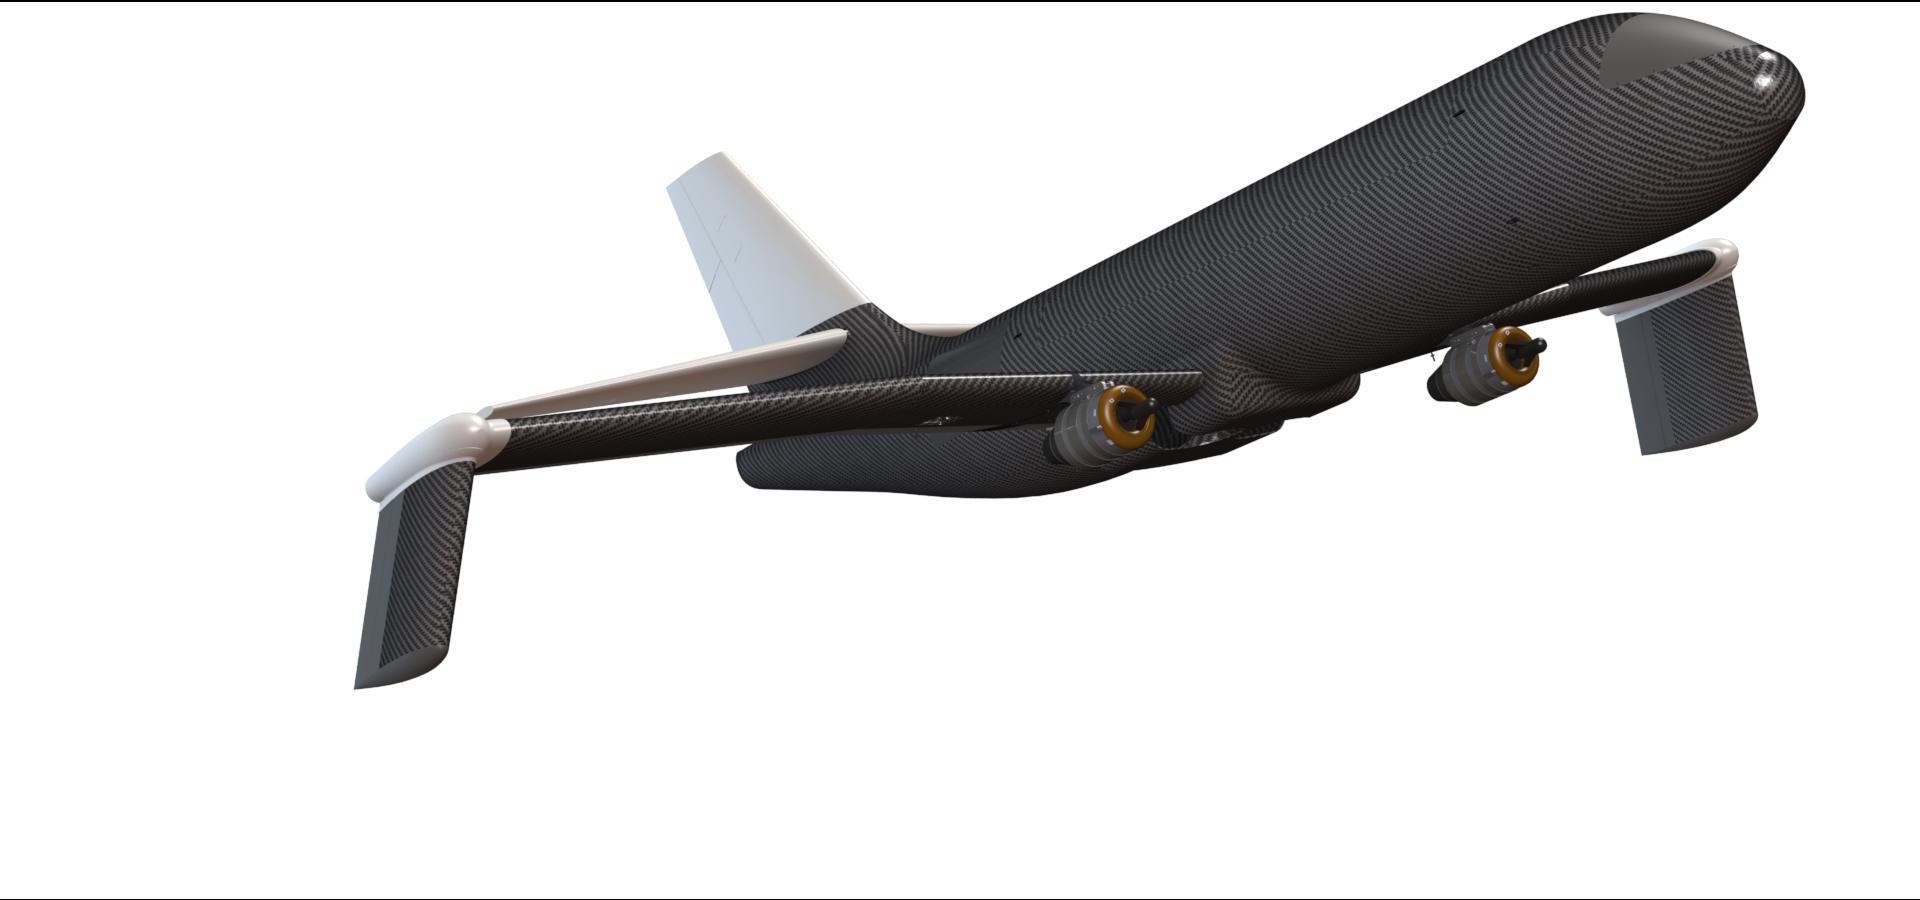 Картинки по запросу Spanwise Adaptive Wing